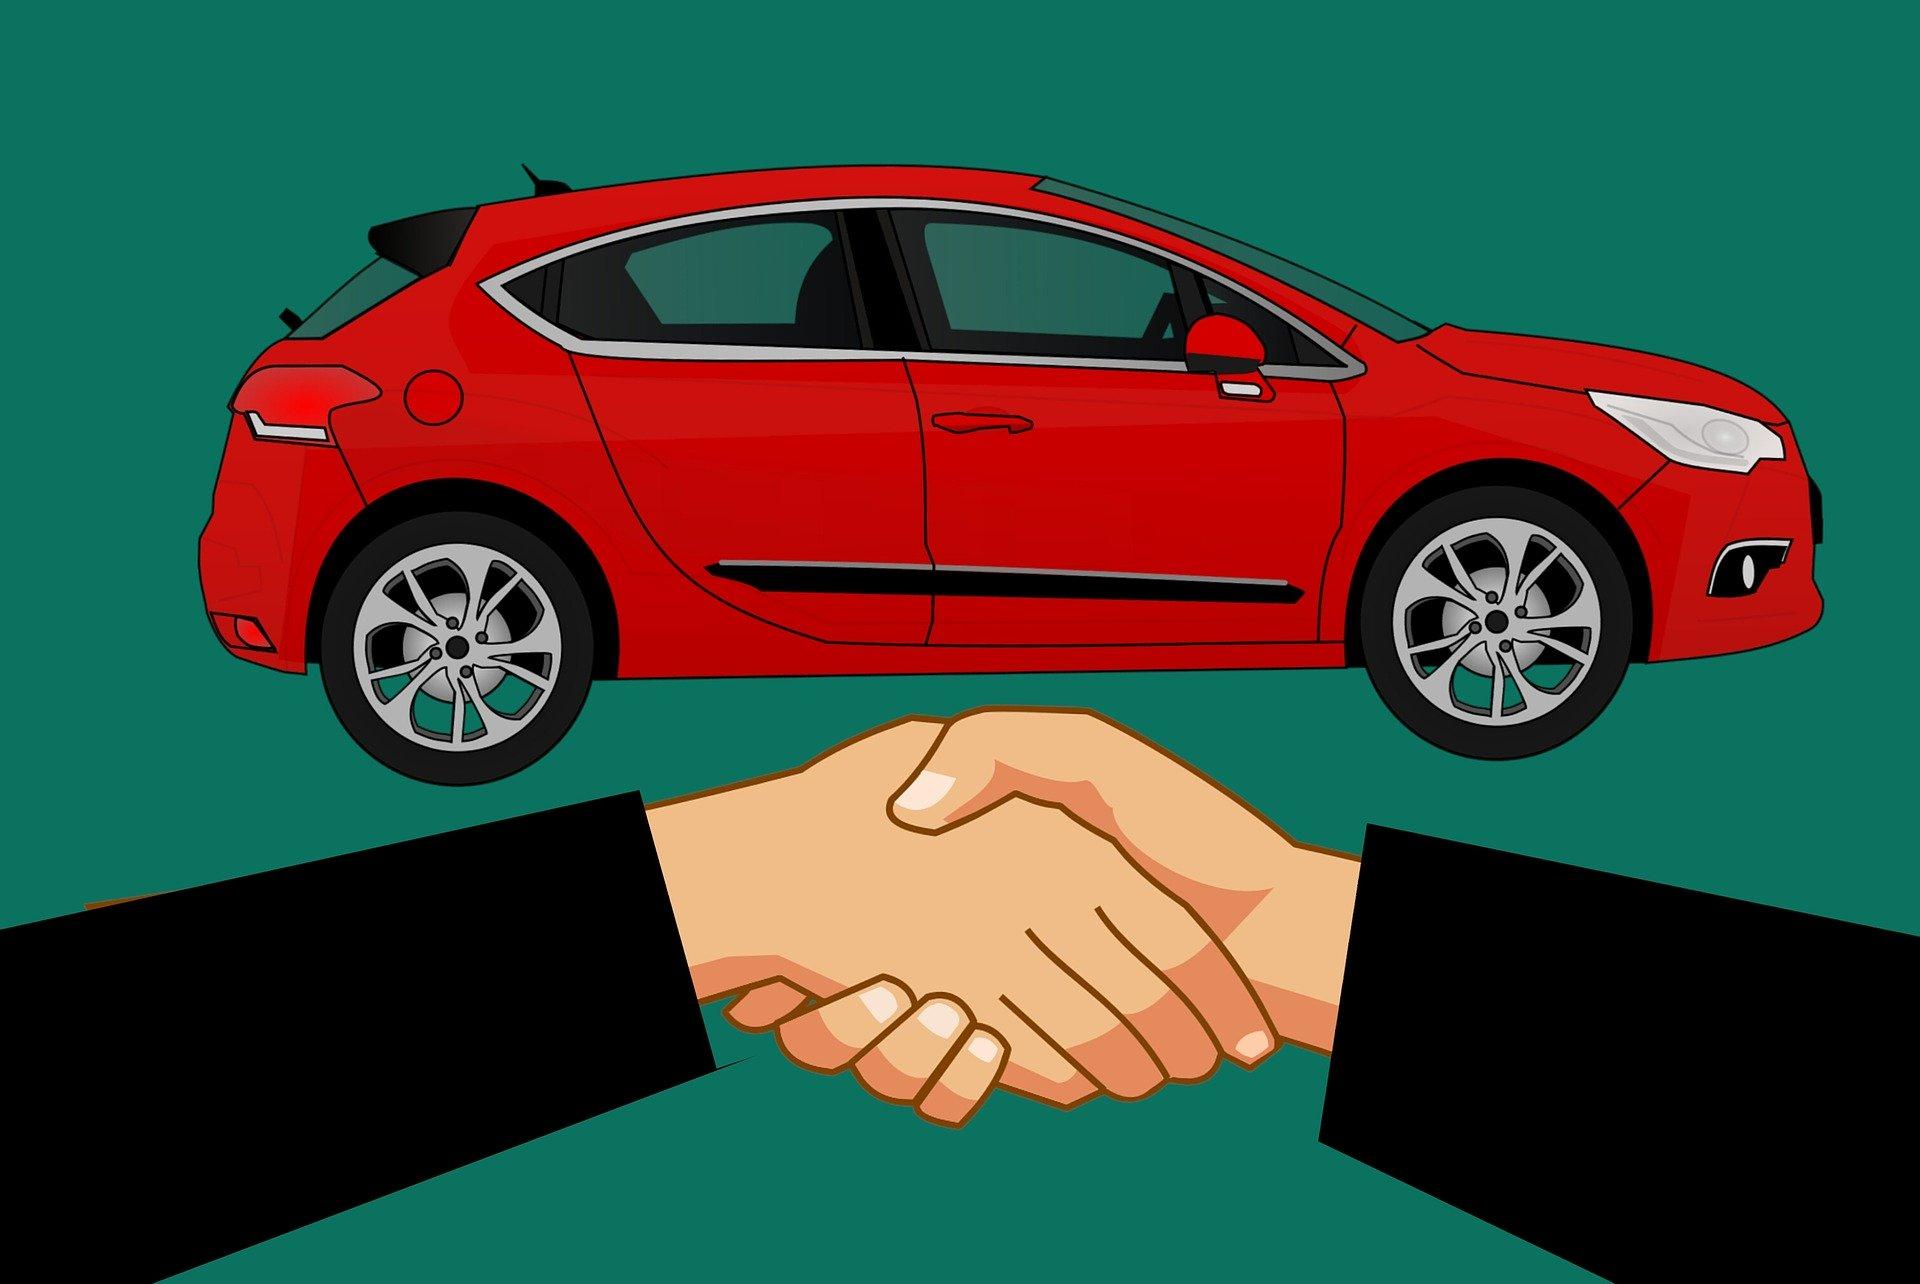 Transakcja zakupu samochodu